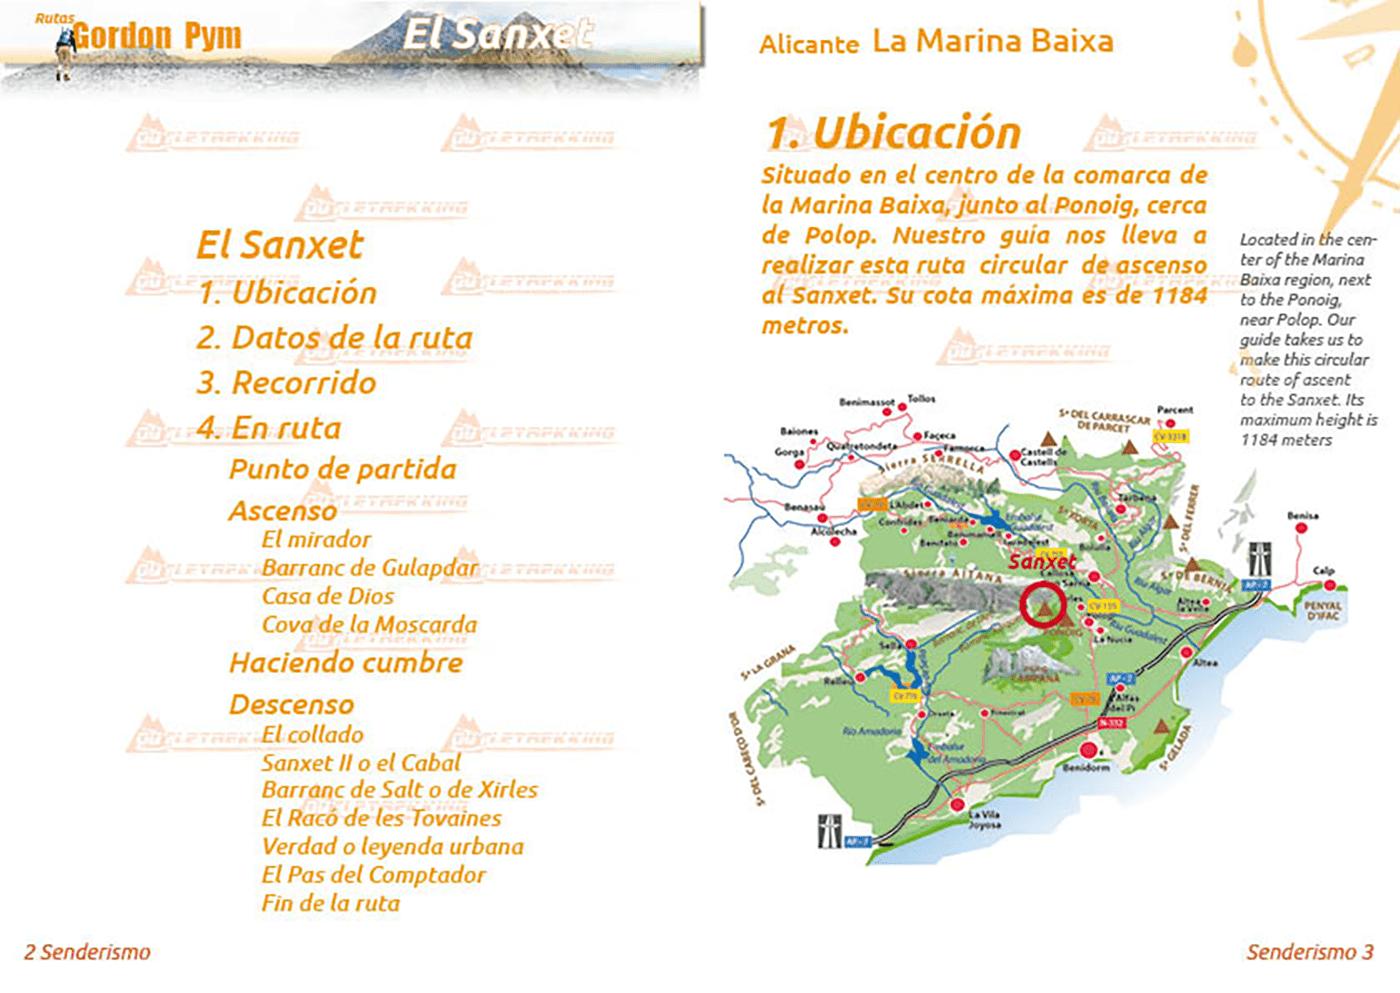 pags-2-3-folleto-ruta-el-sanxet